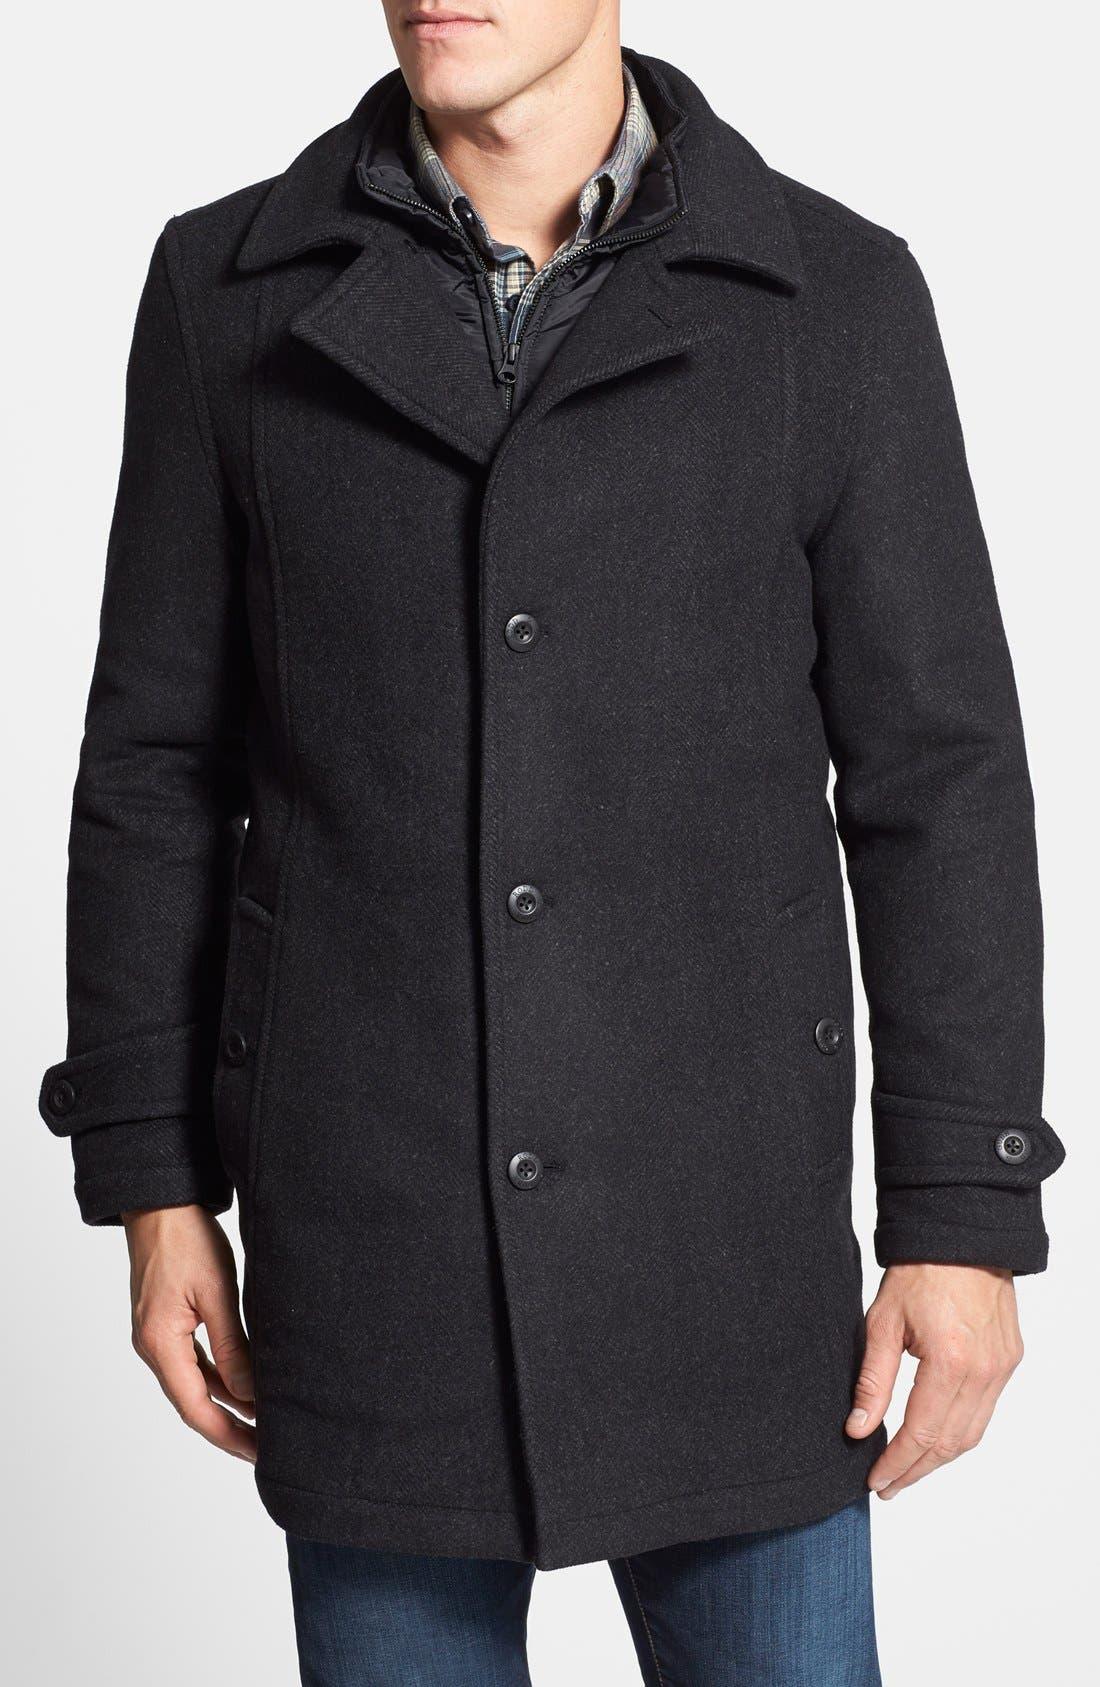 Rodd & Gunn 'Westown' 3-in-1 Wool Blend Coat